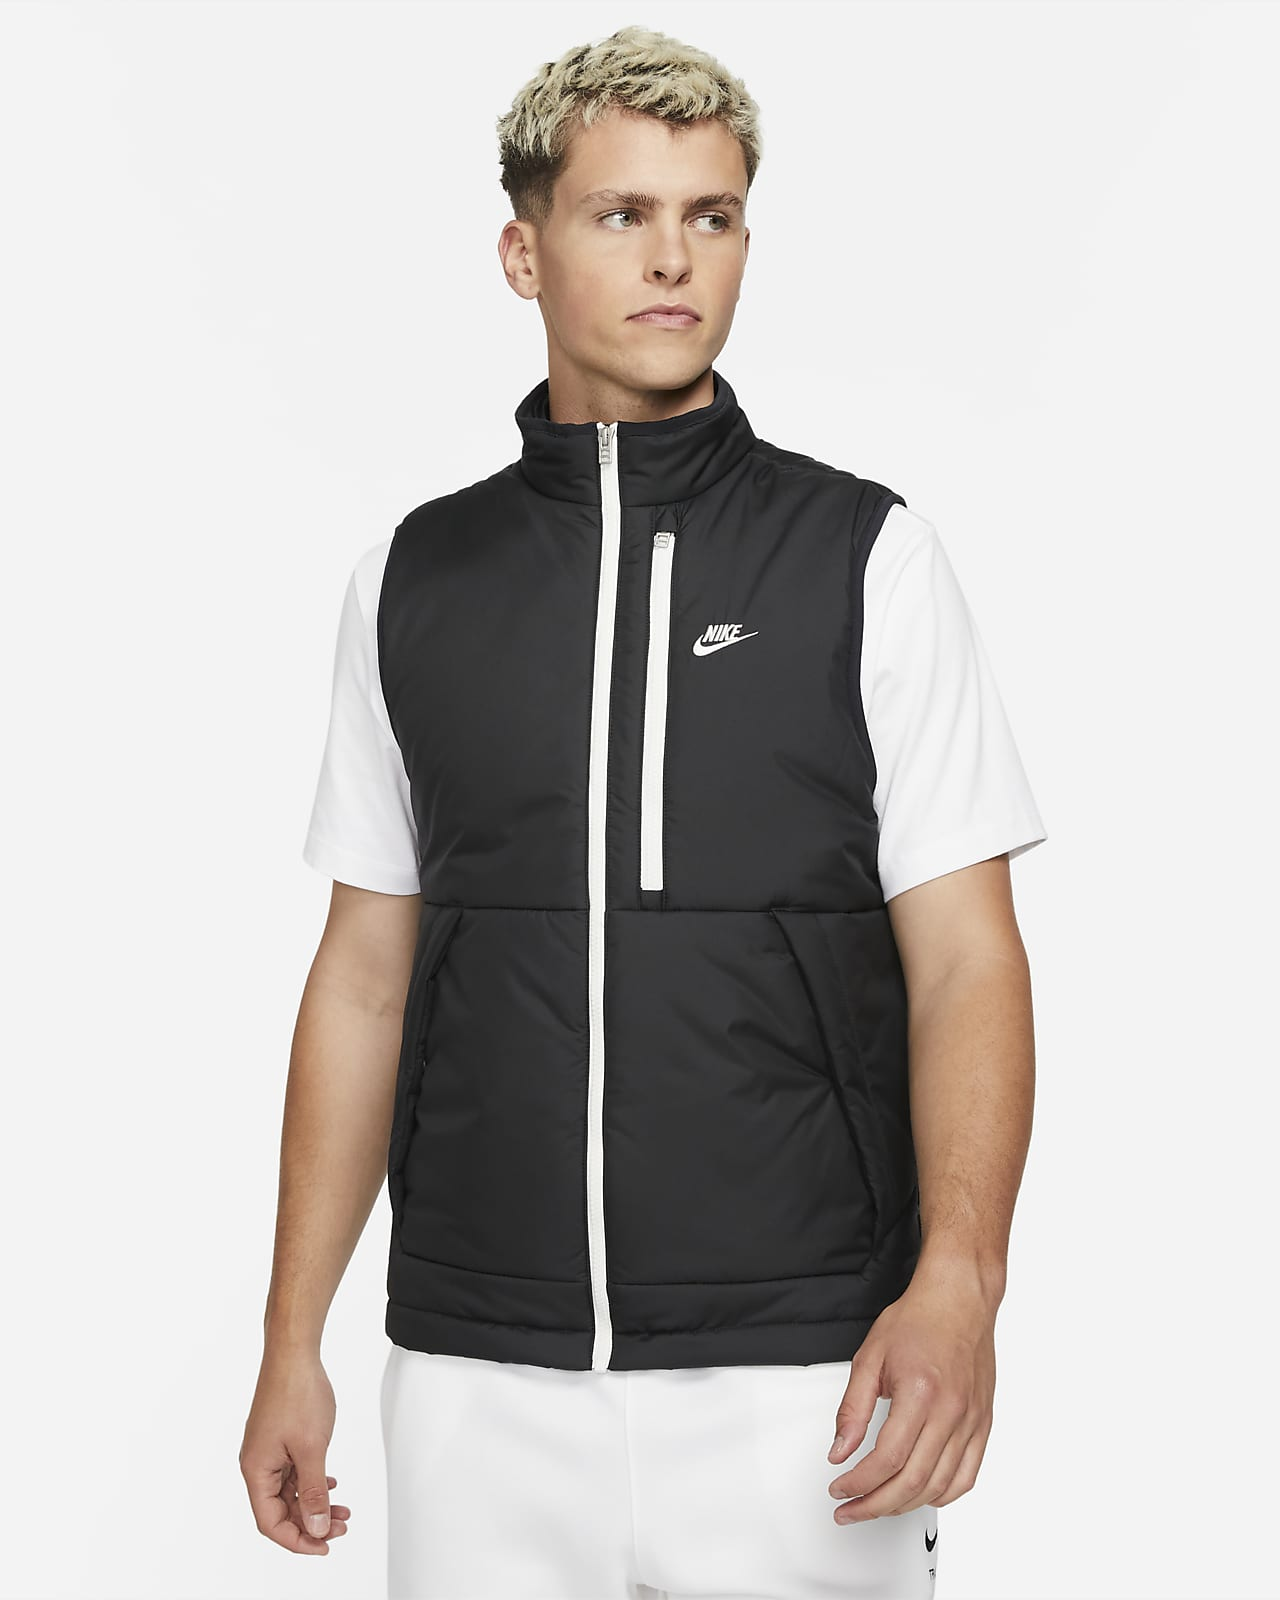 Nike Sportswear Therma-FIT Legacy Men's Hooded Gilet